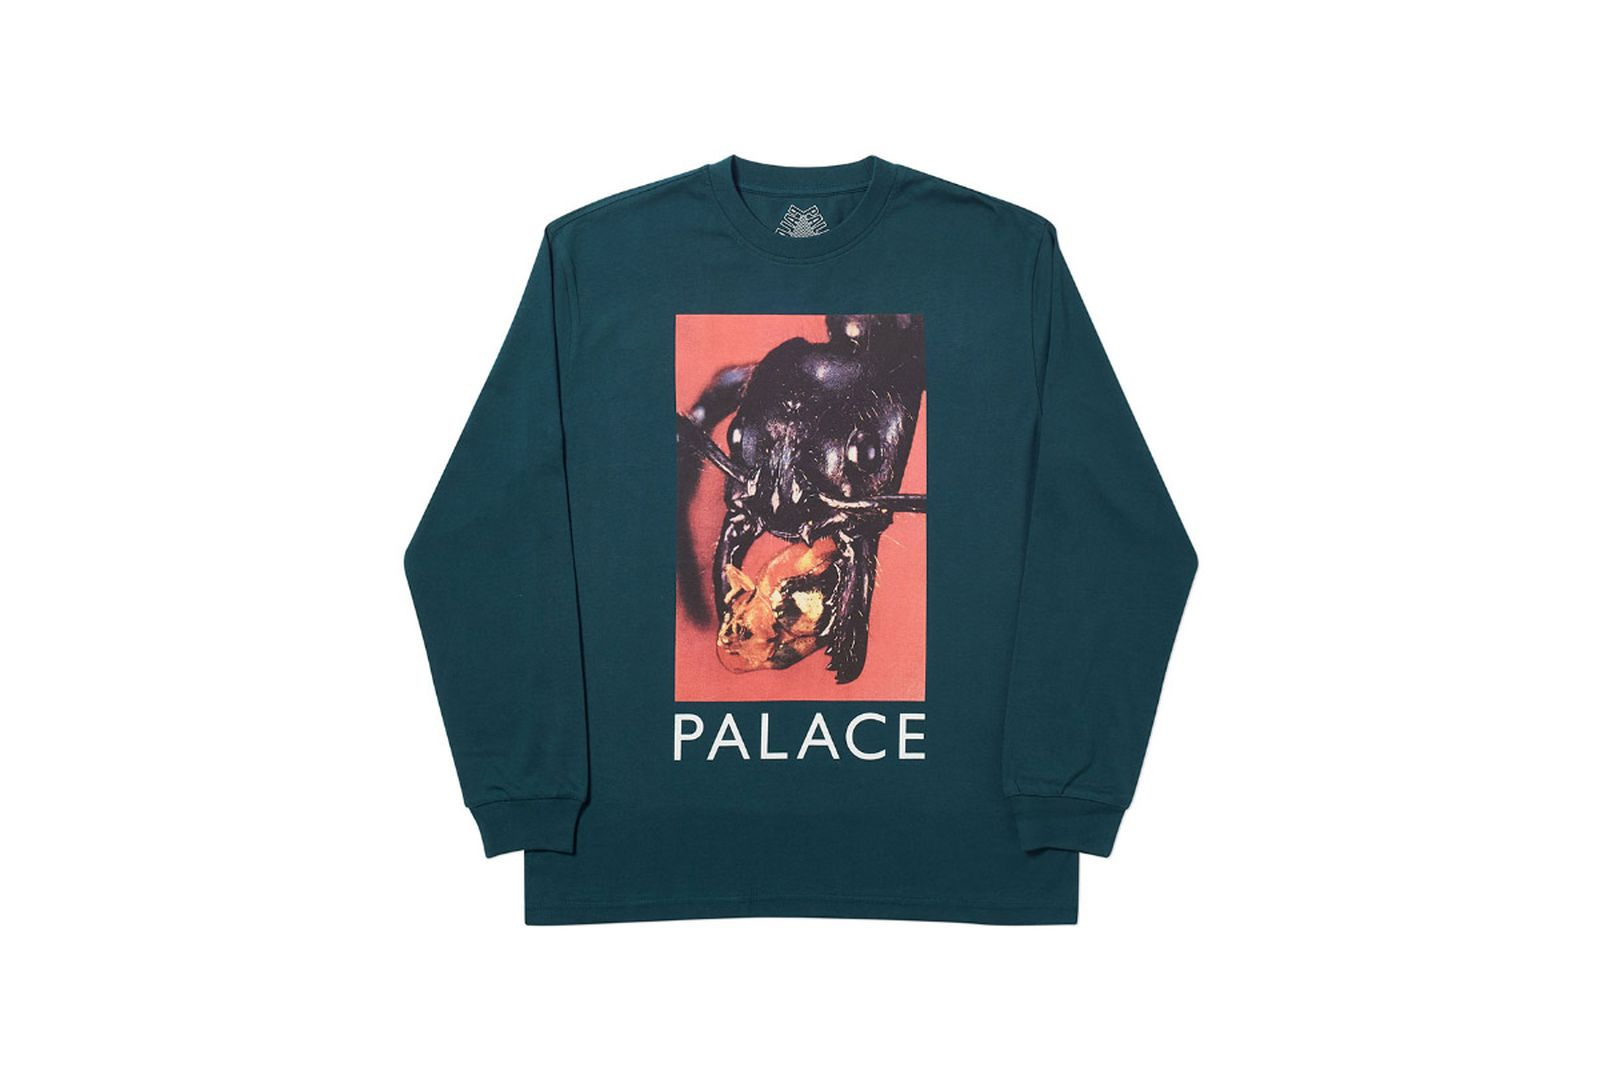 Palace 2019 Autumn Longsleeve T Shirt Bug Munch green 1369 ADJUSTED